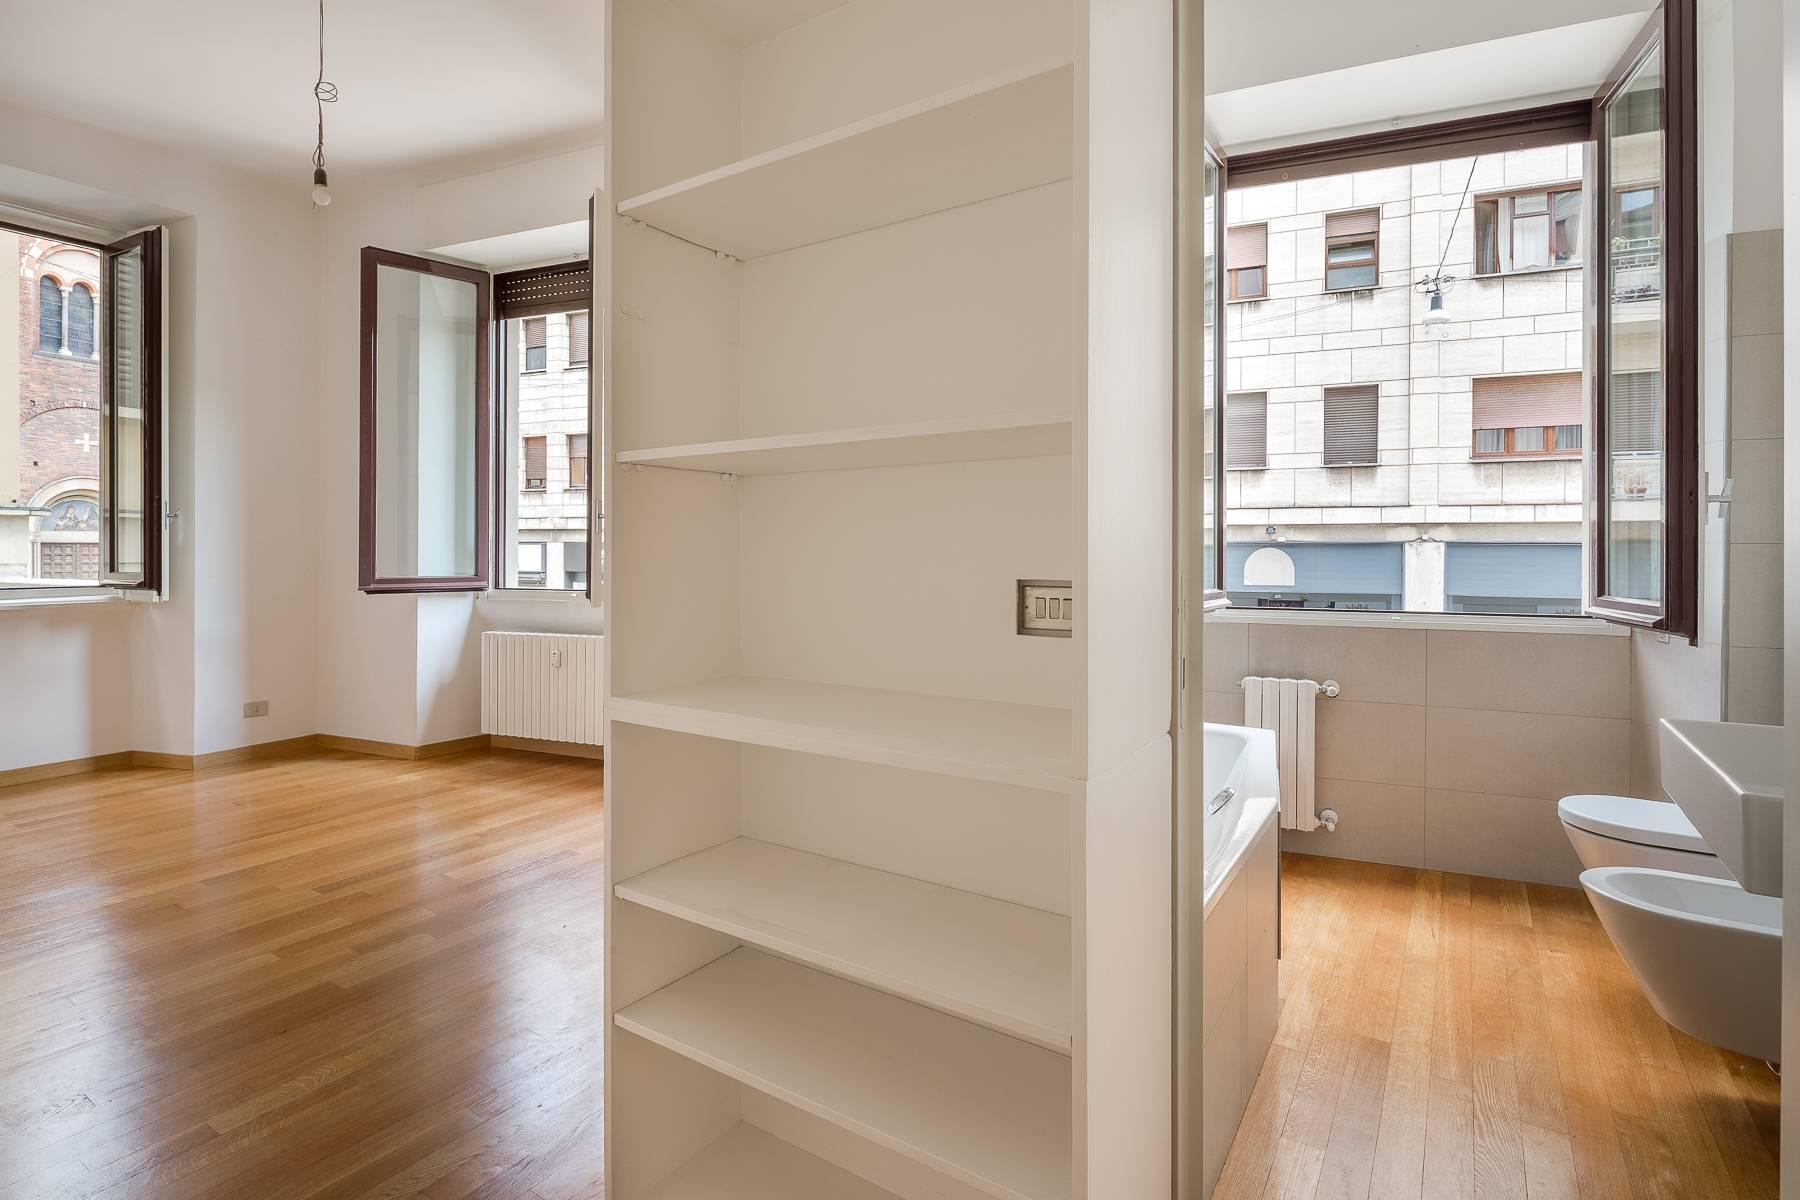 Apartment in an elegant period building located in a prestigious city district - 11